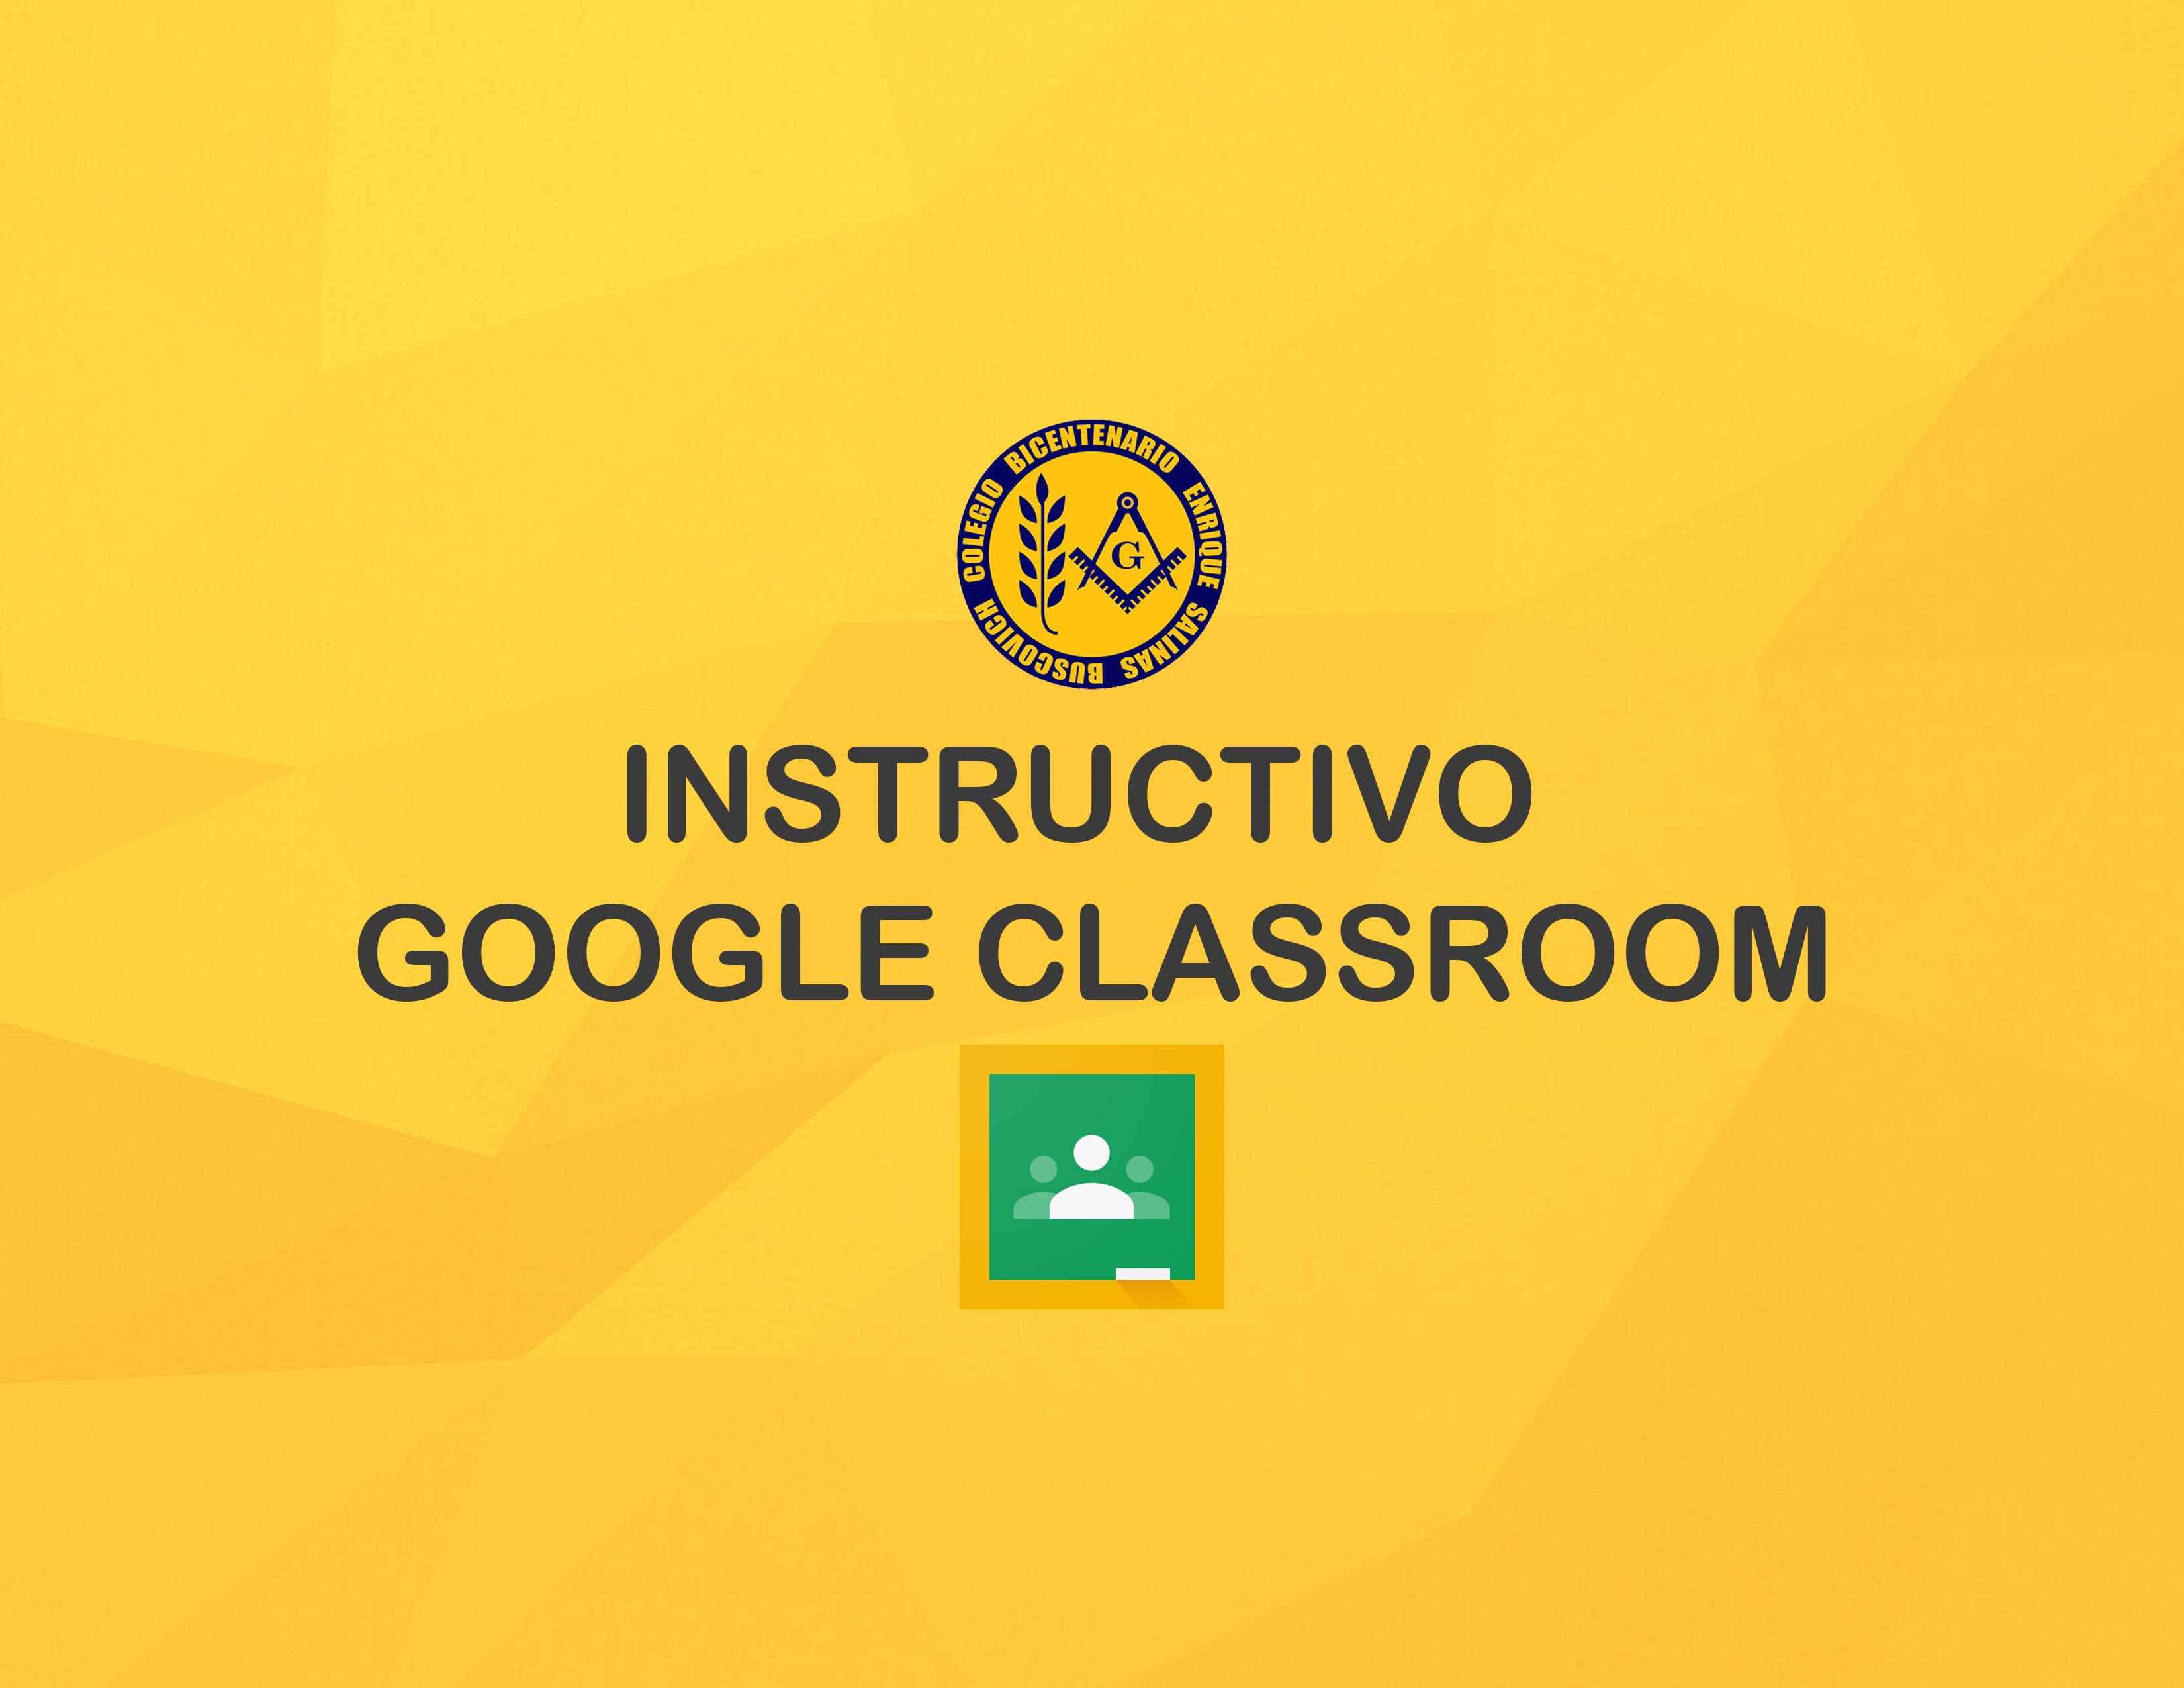 Instructivo para Google Classroom